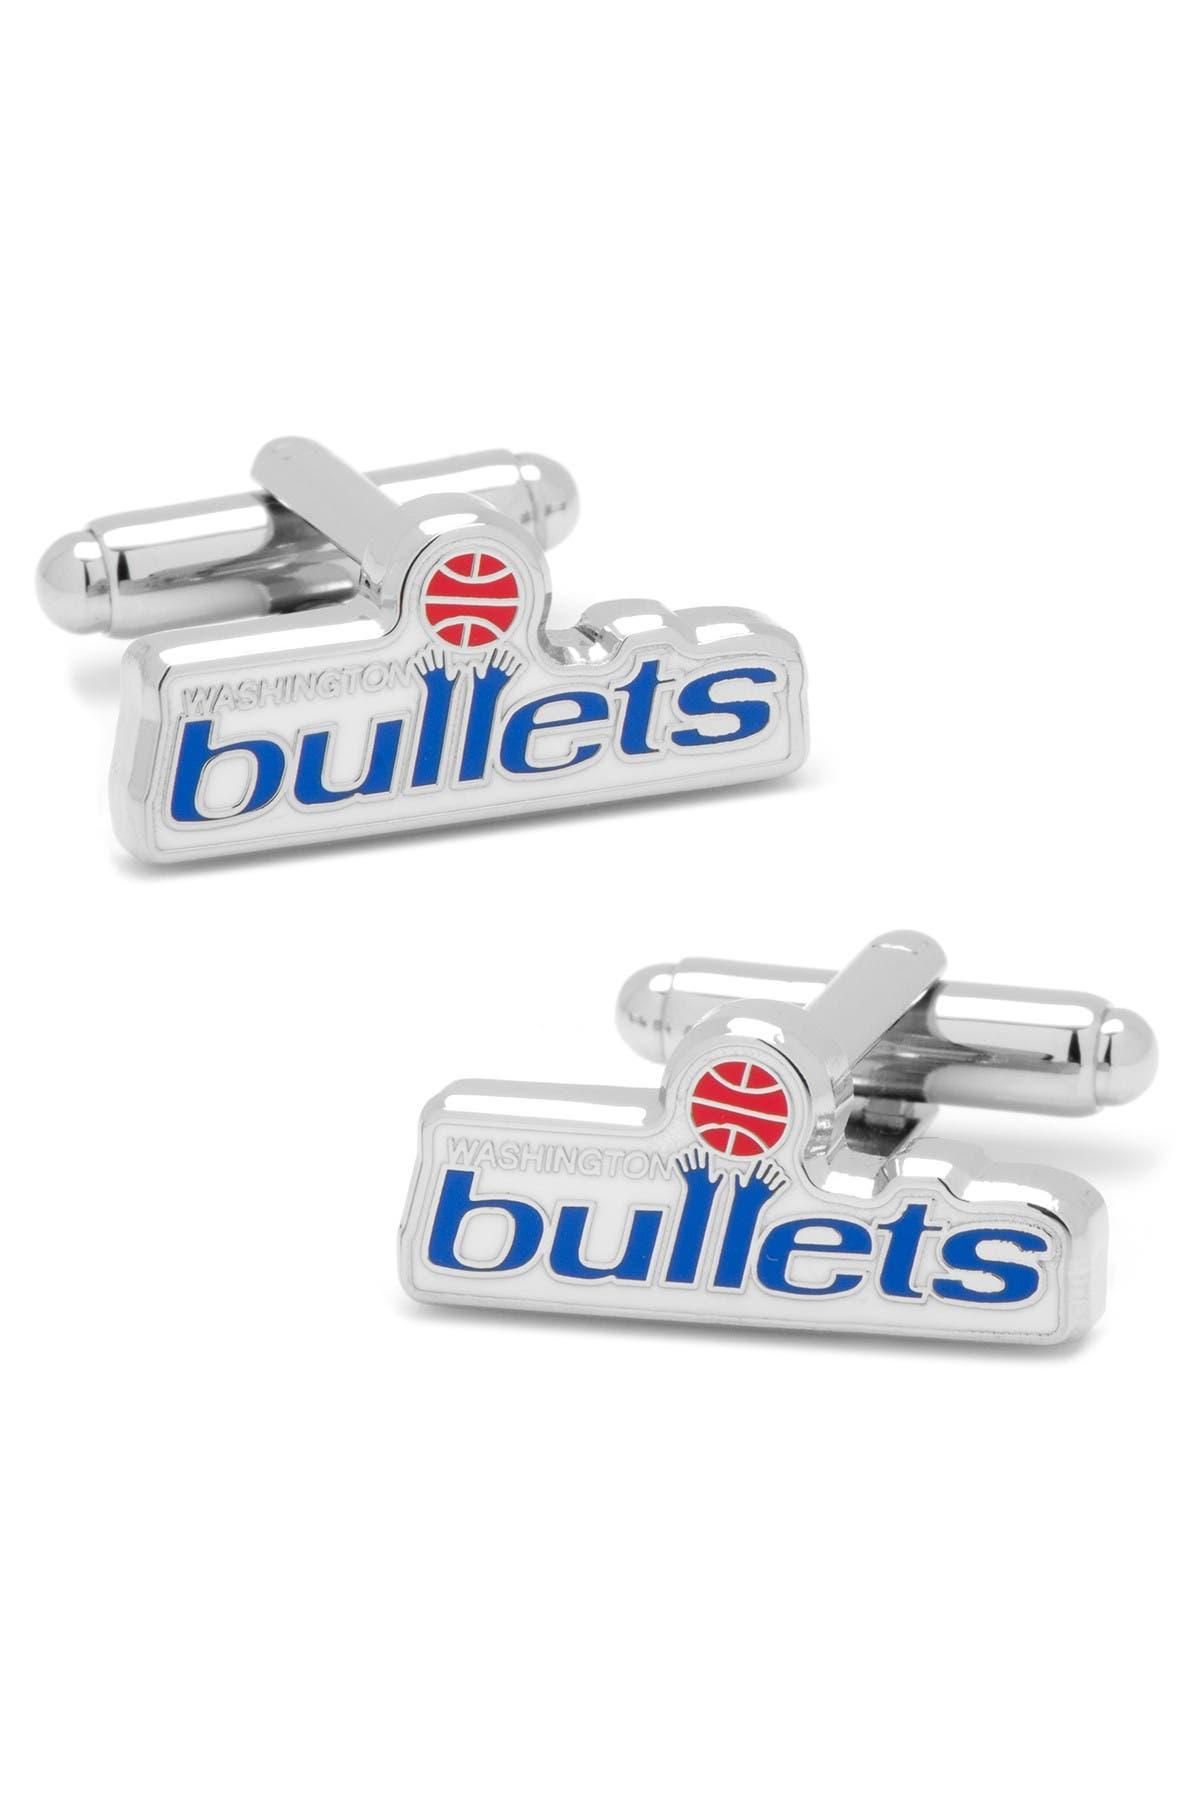 Image of Cufflinks Inc. NBA Washington Bullets Cuff Links